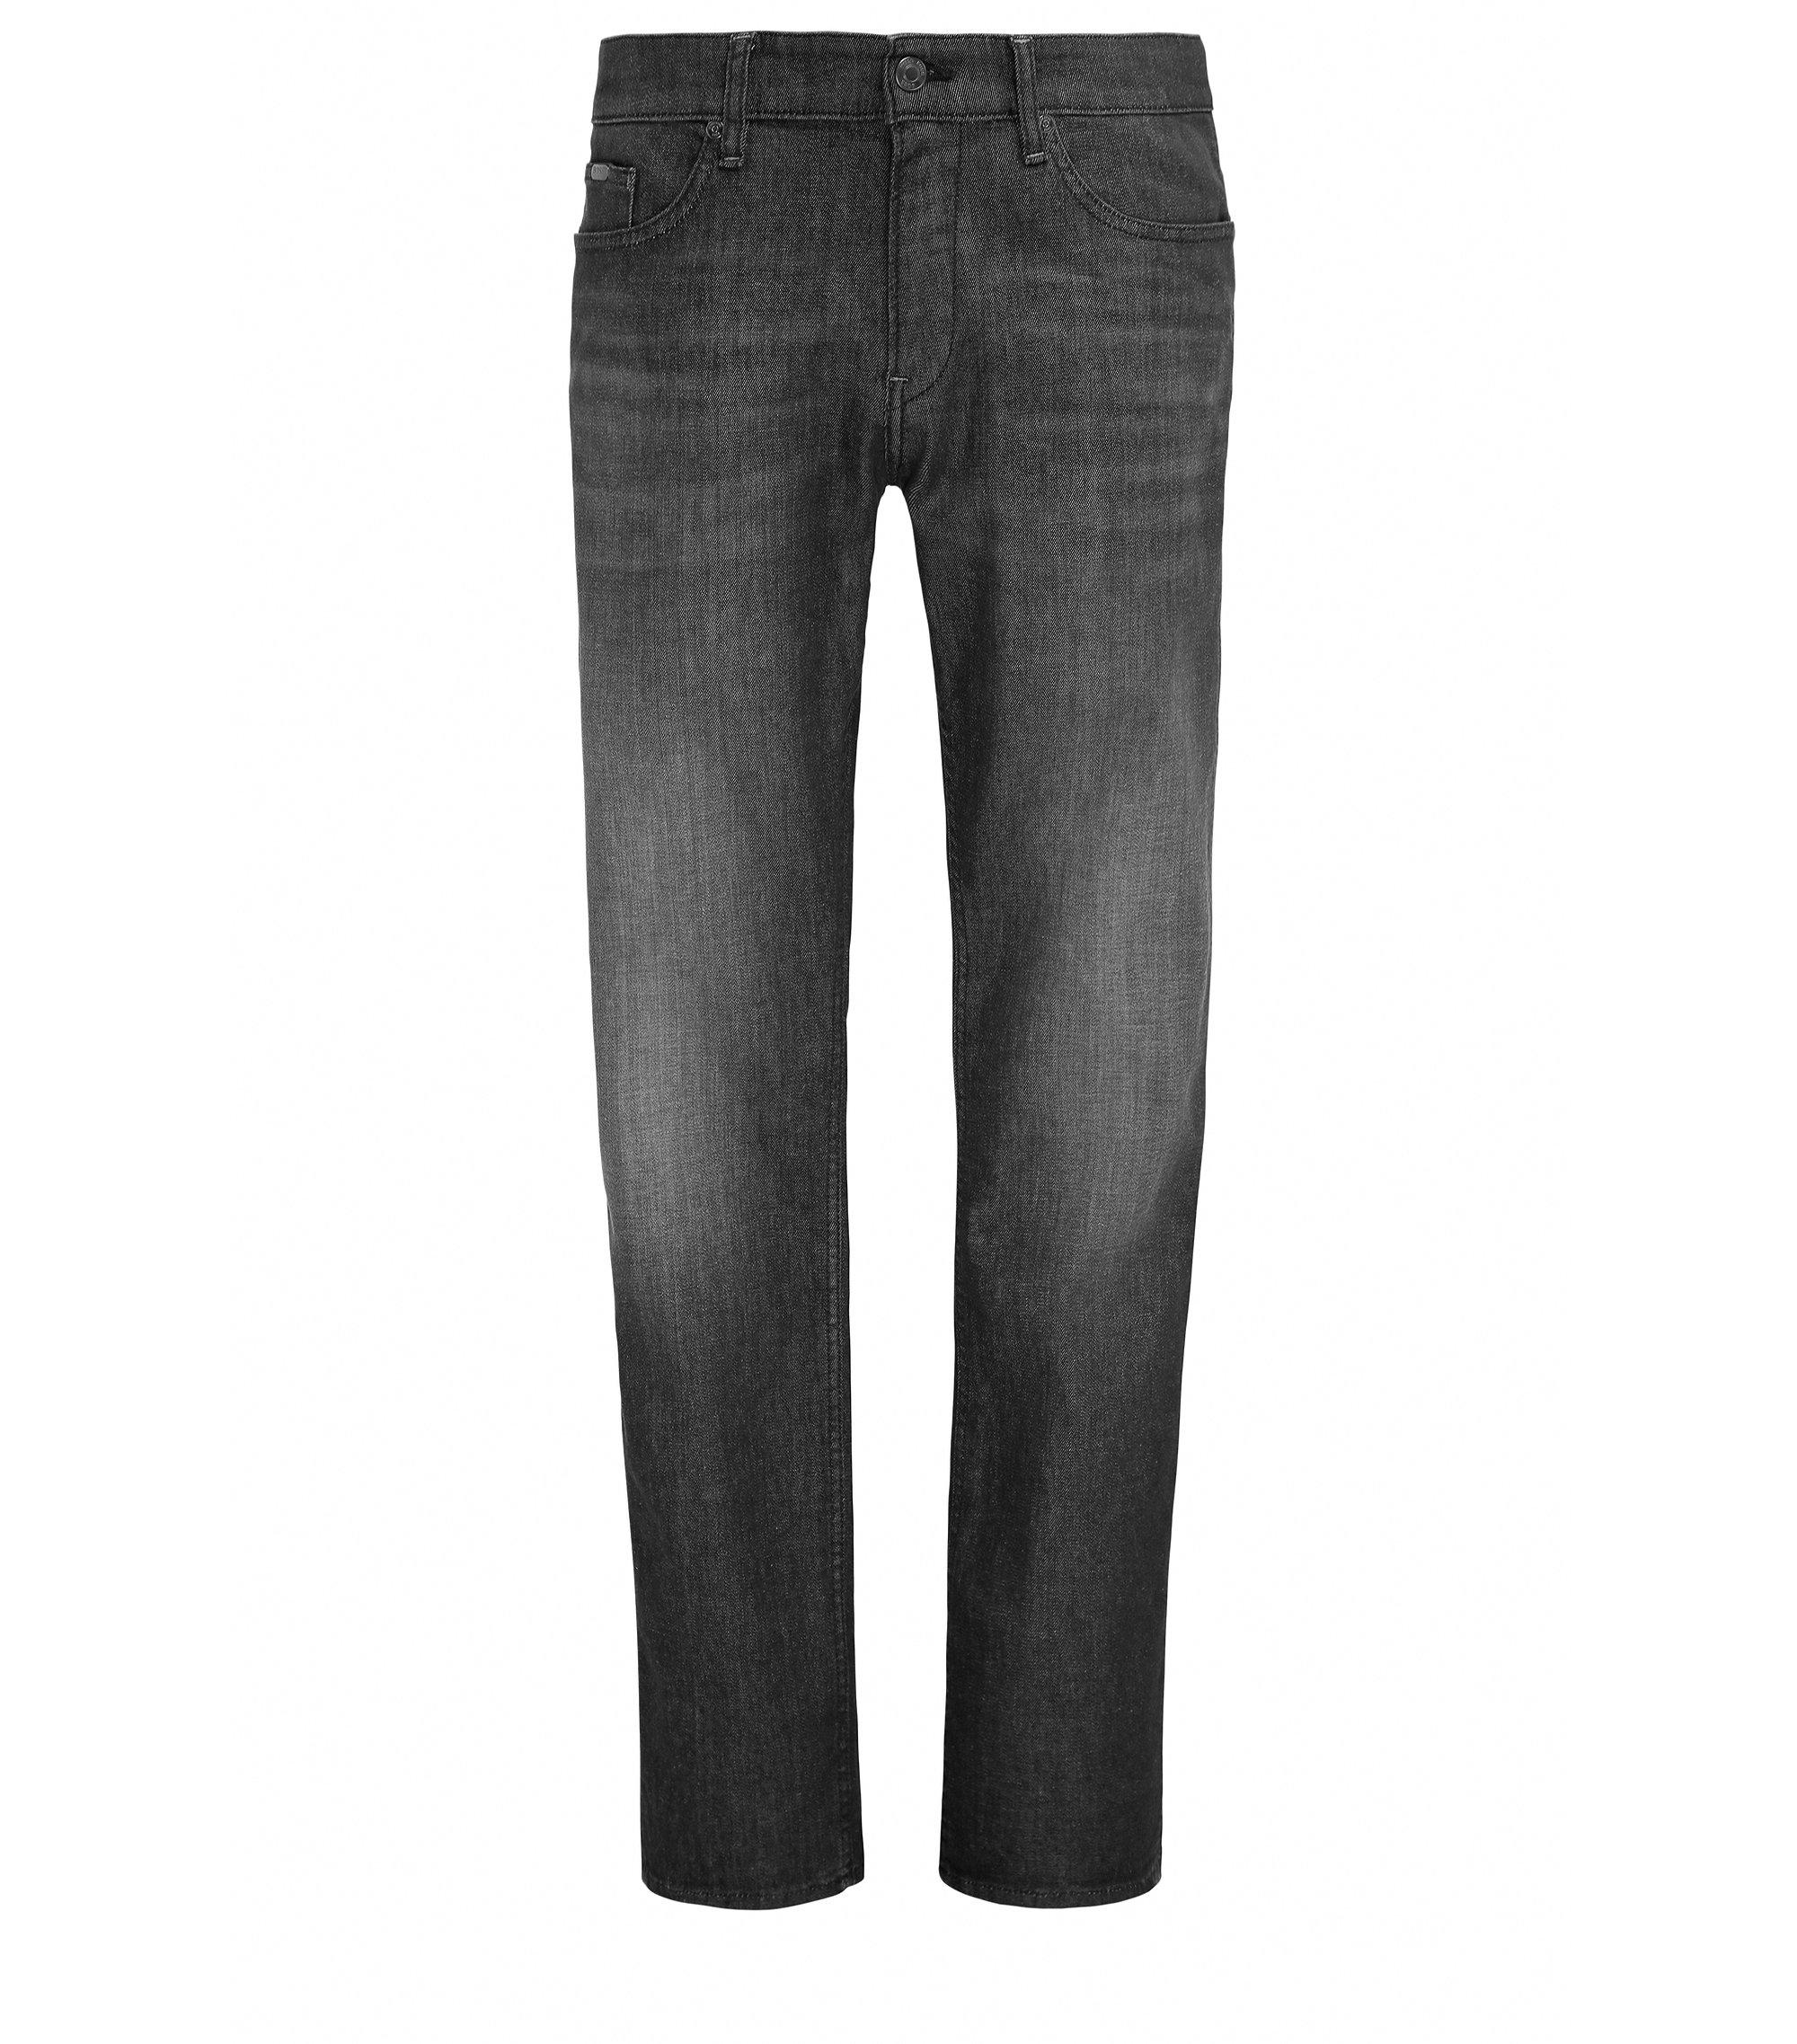 Slim-fit jeans in comfort-stretch denim, Anthracite